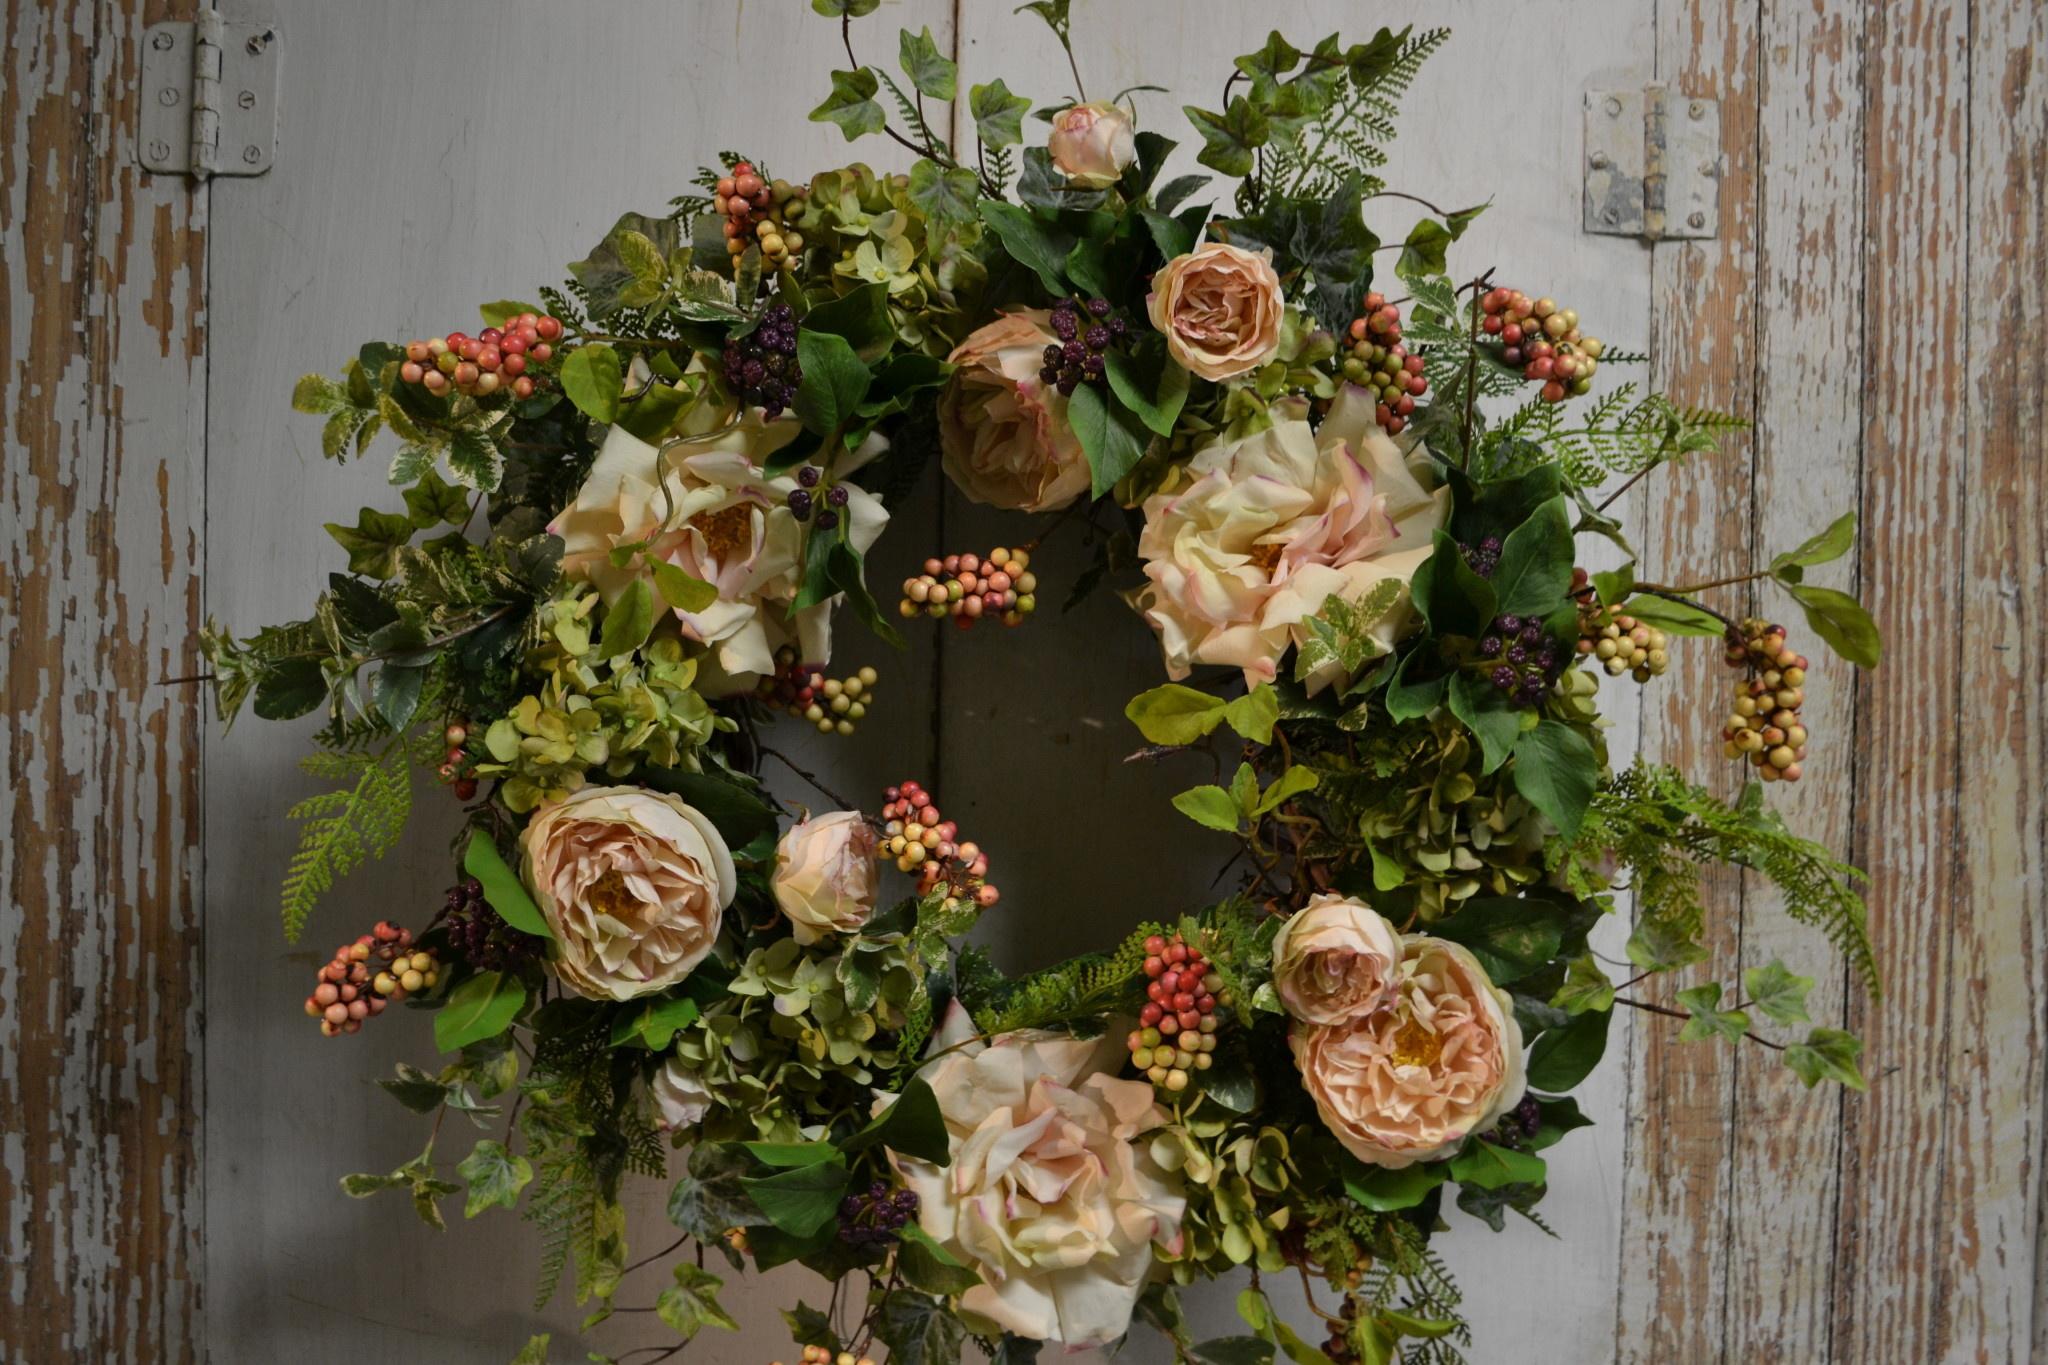 Rose and Green Hydrangea Wreath